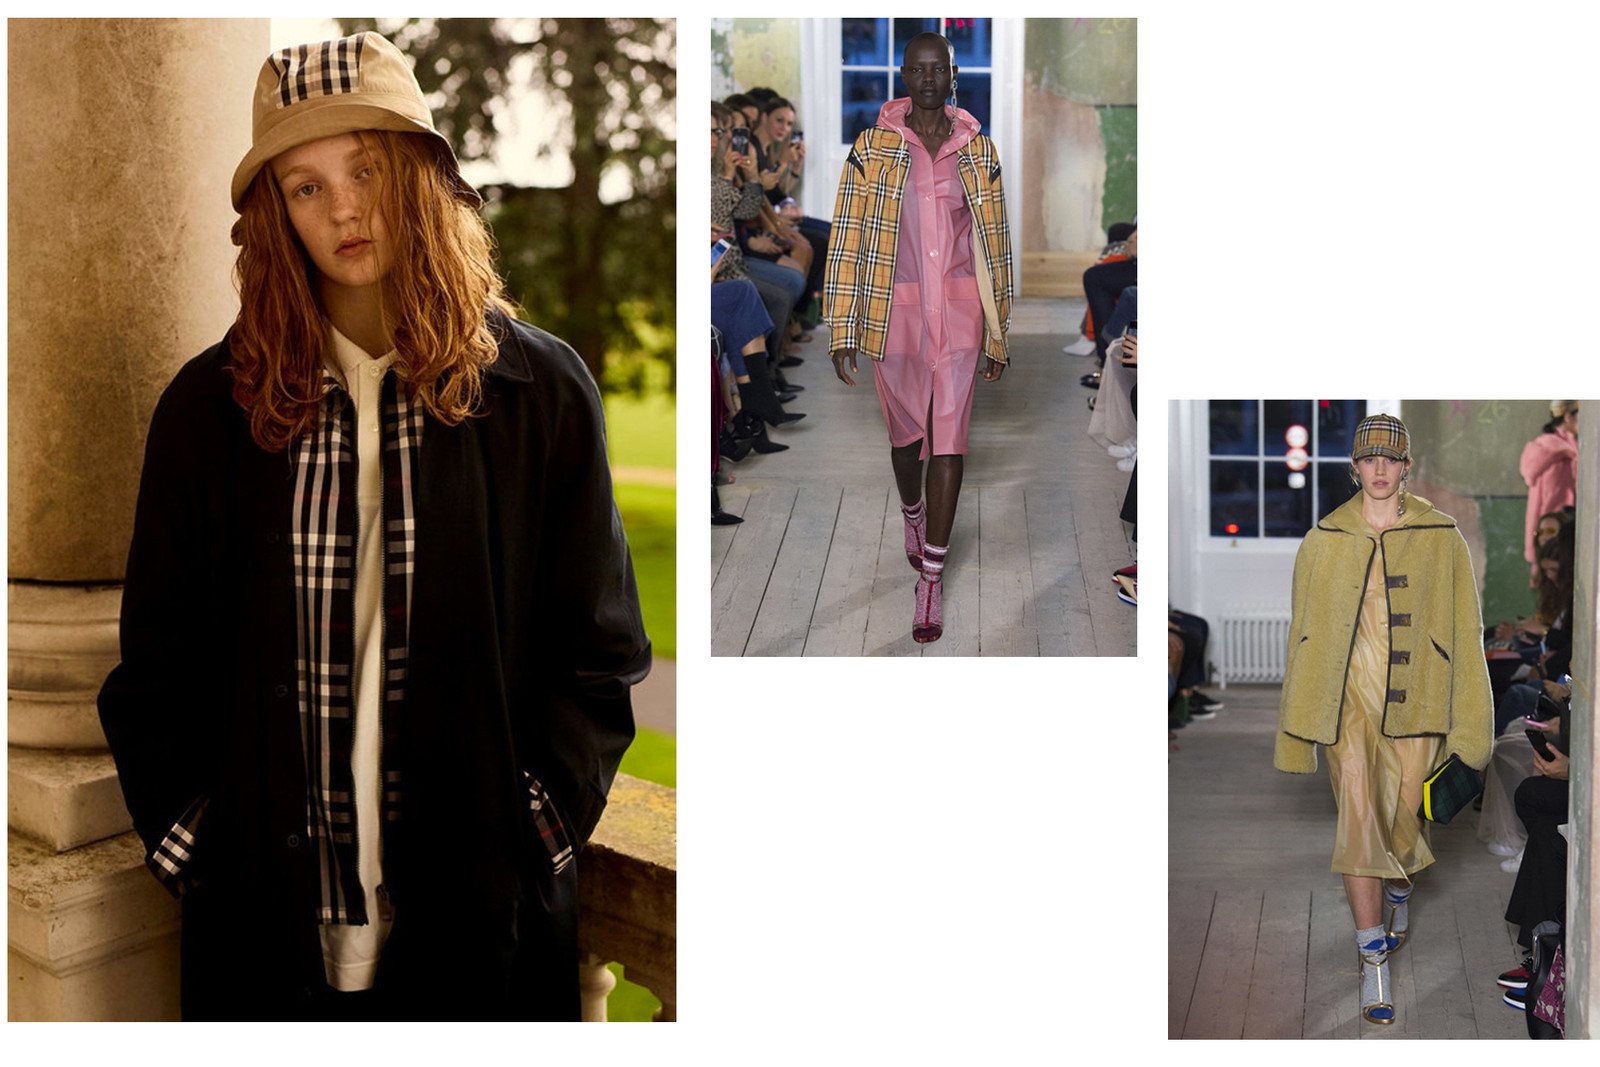 Riccardo Tisci Burberry Prediction Expectation Gosha Rubchinskiy Fall Winter Spring Summer Fashion Week London Fashion Week LFW Collection Designer Show